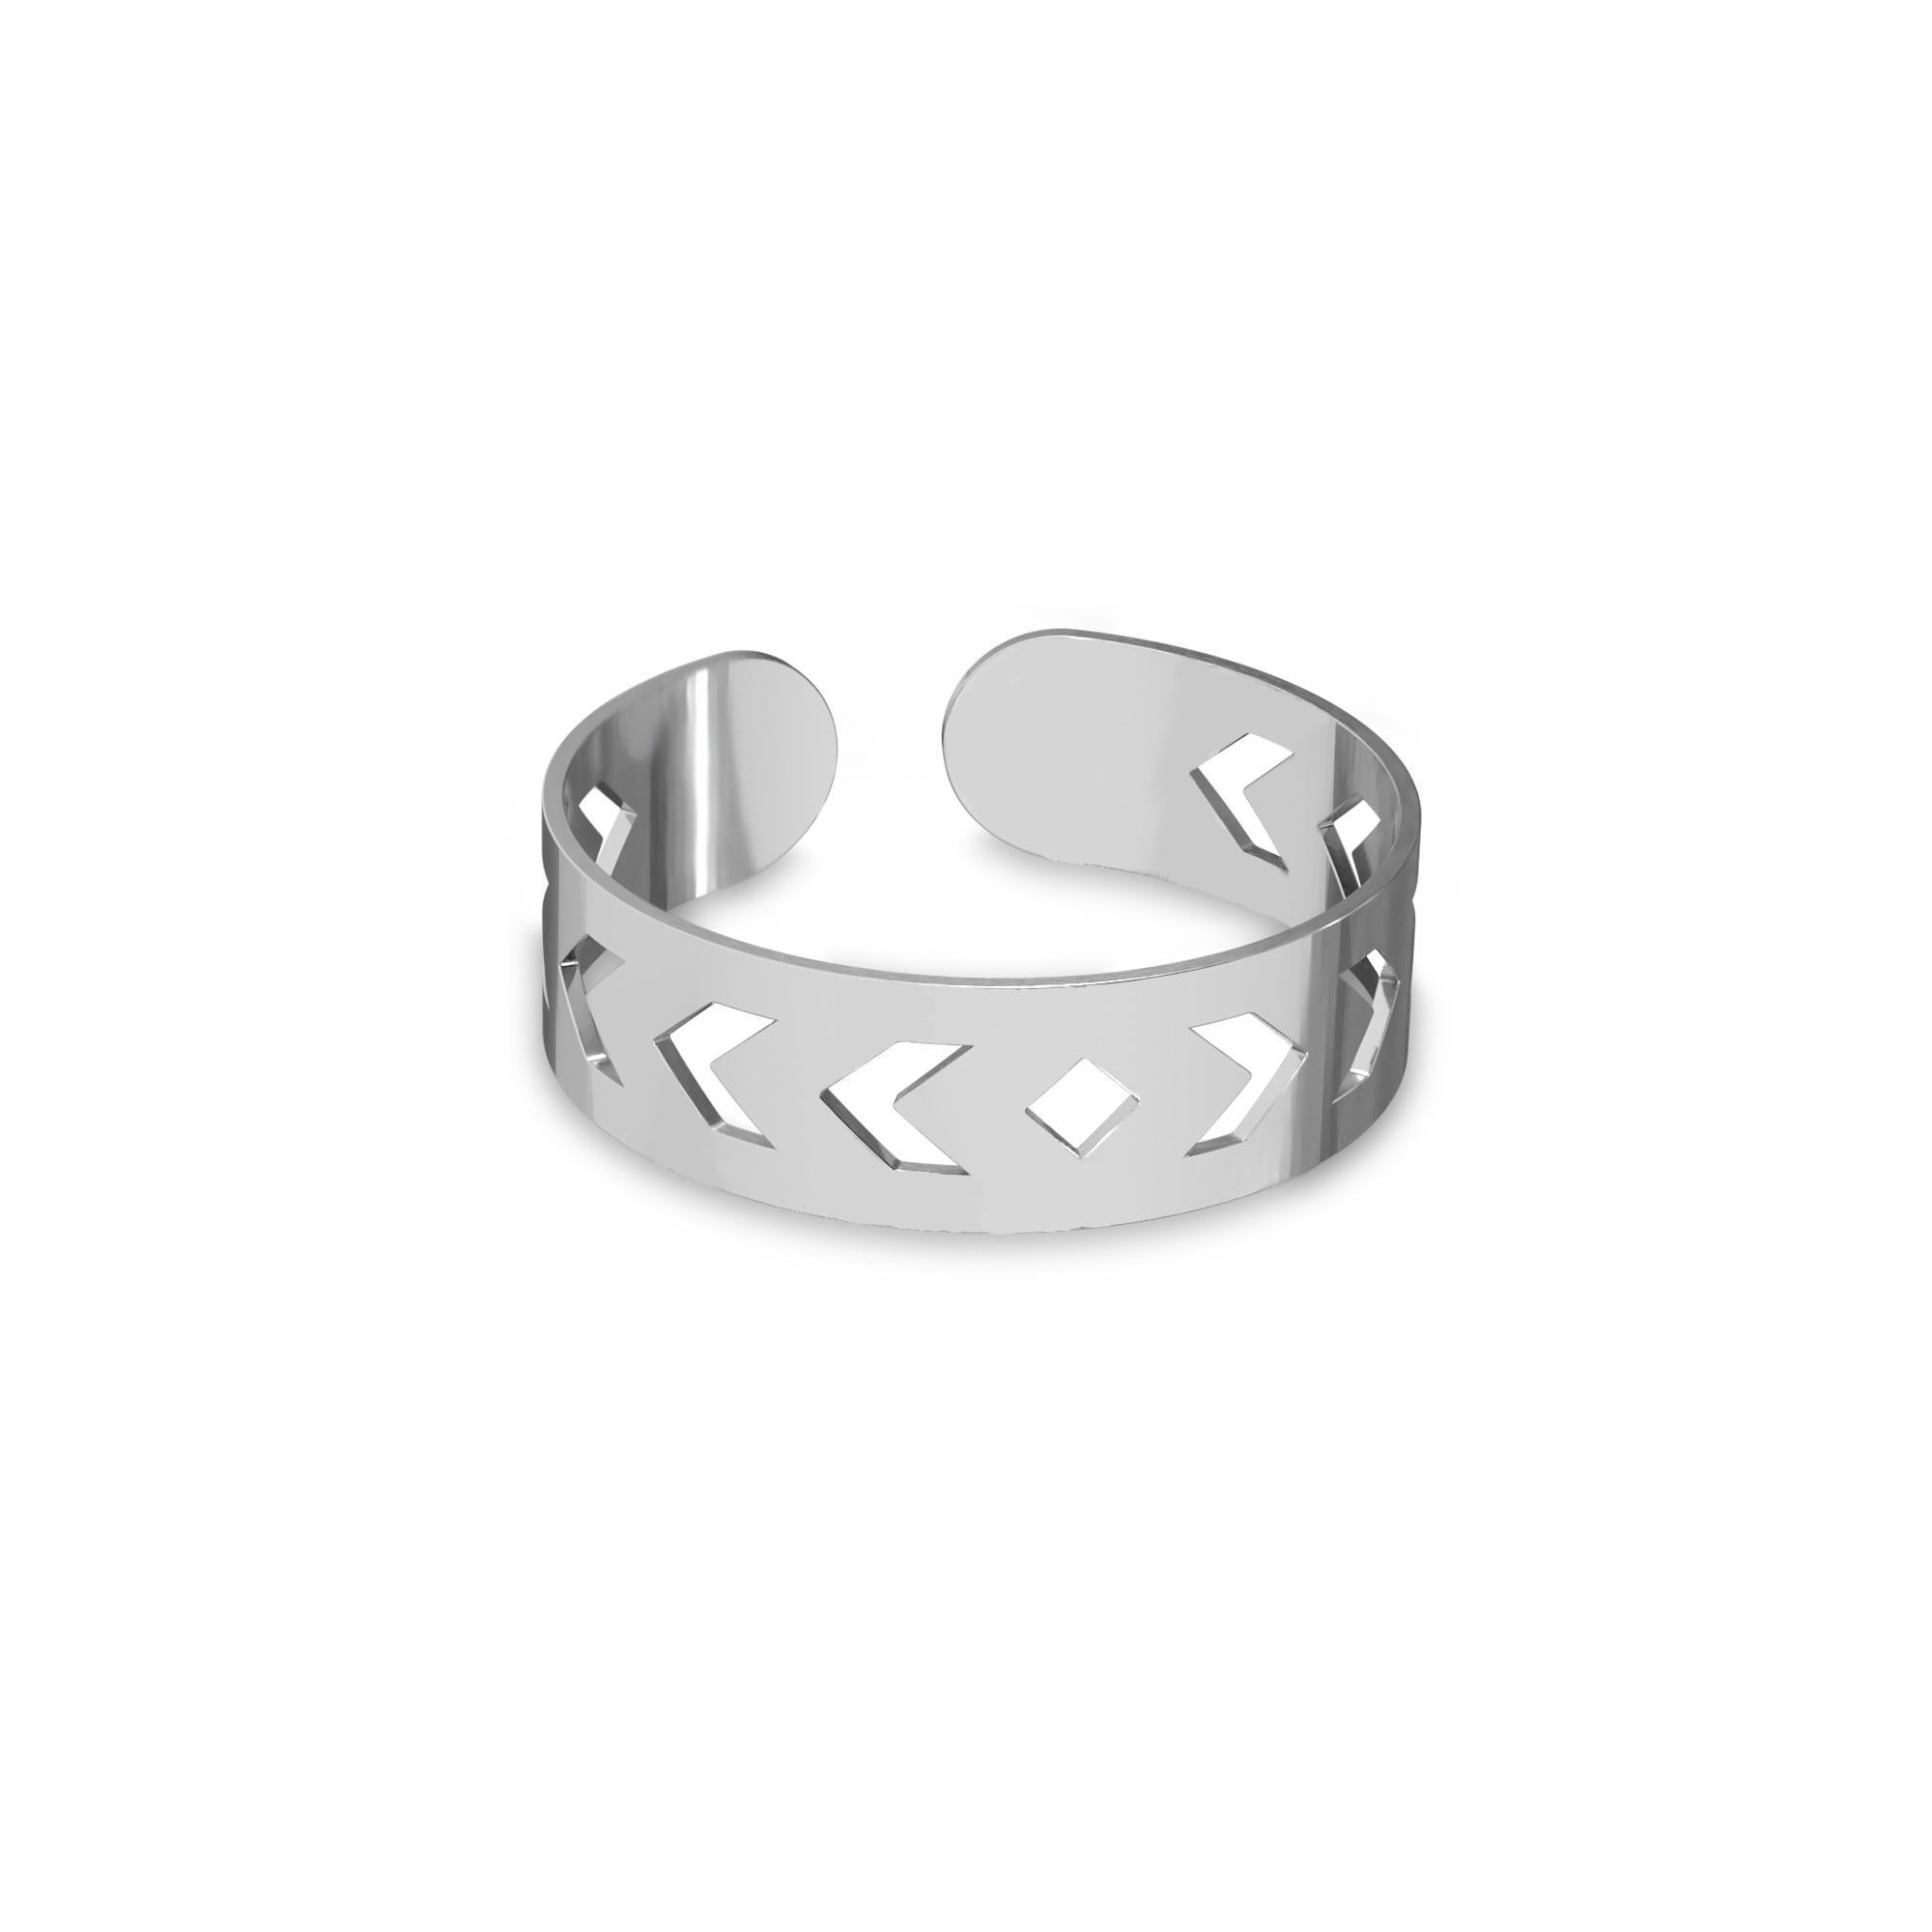 Srebrny pierścionek na początek palca strzałki, srebro 925